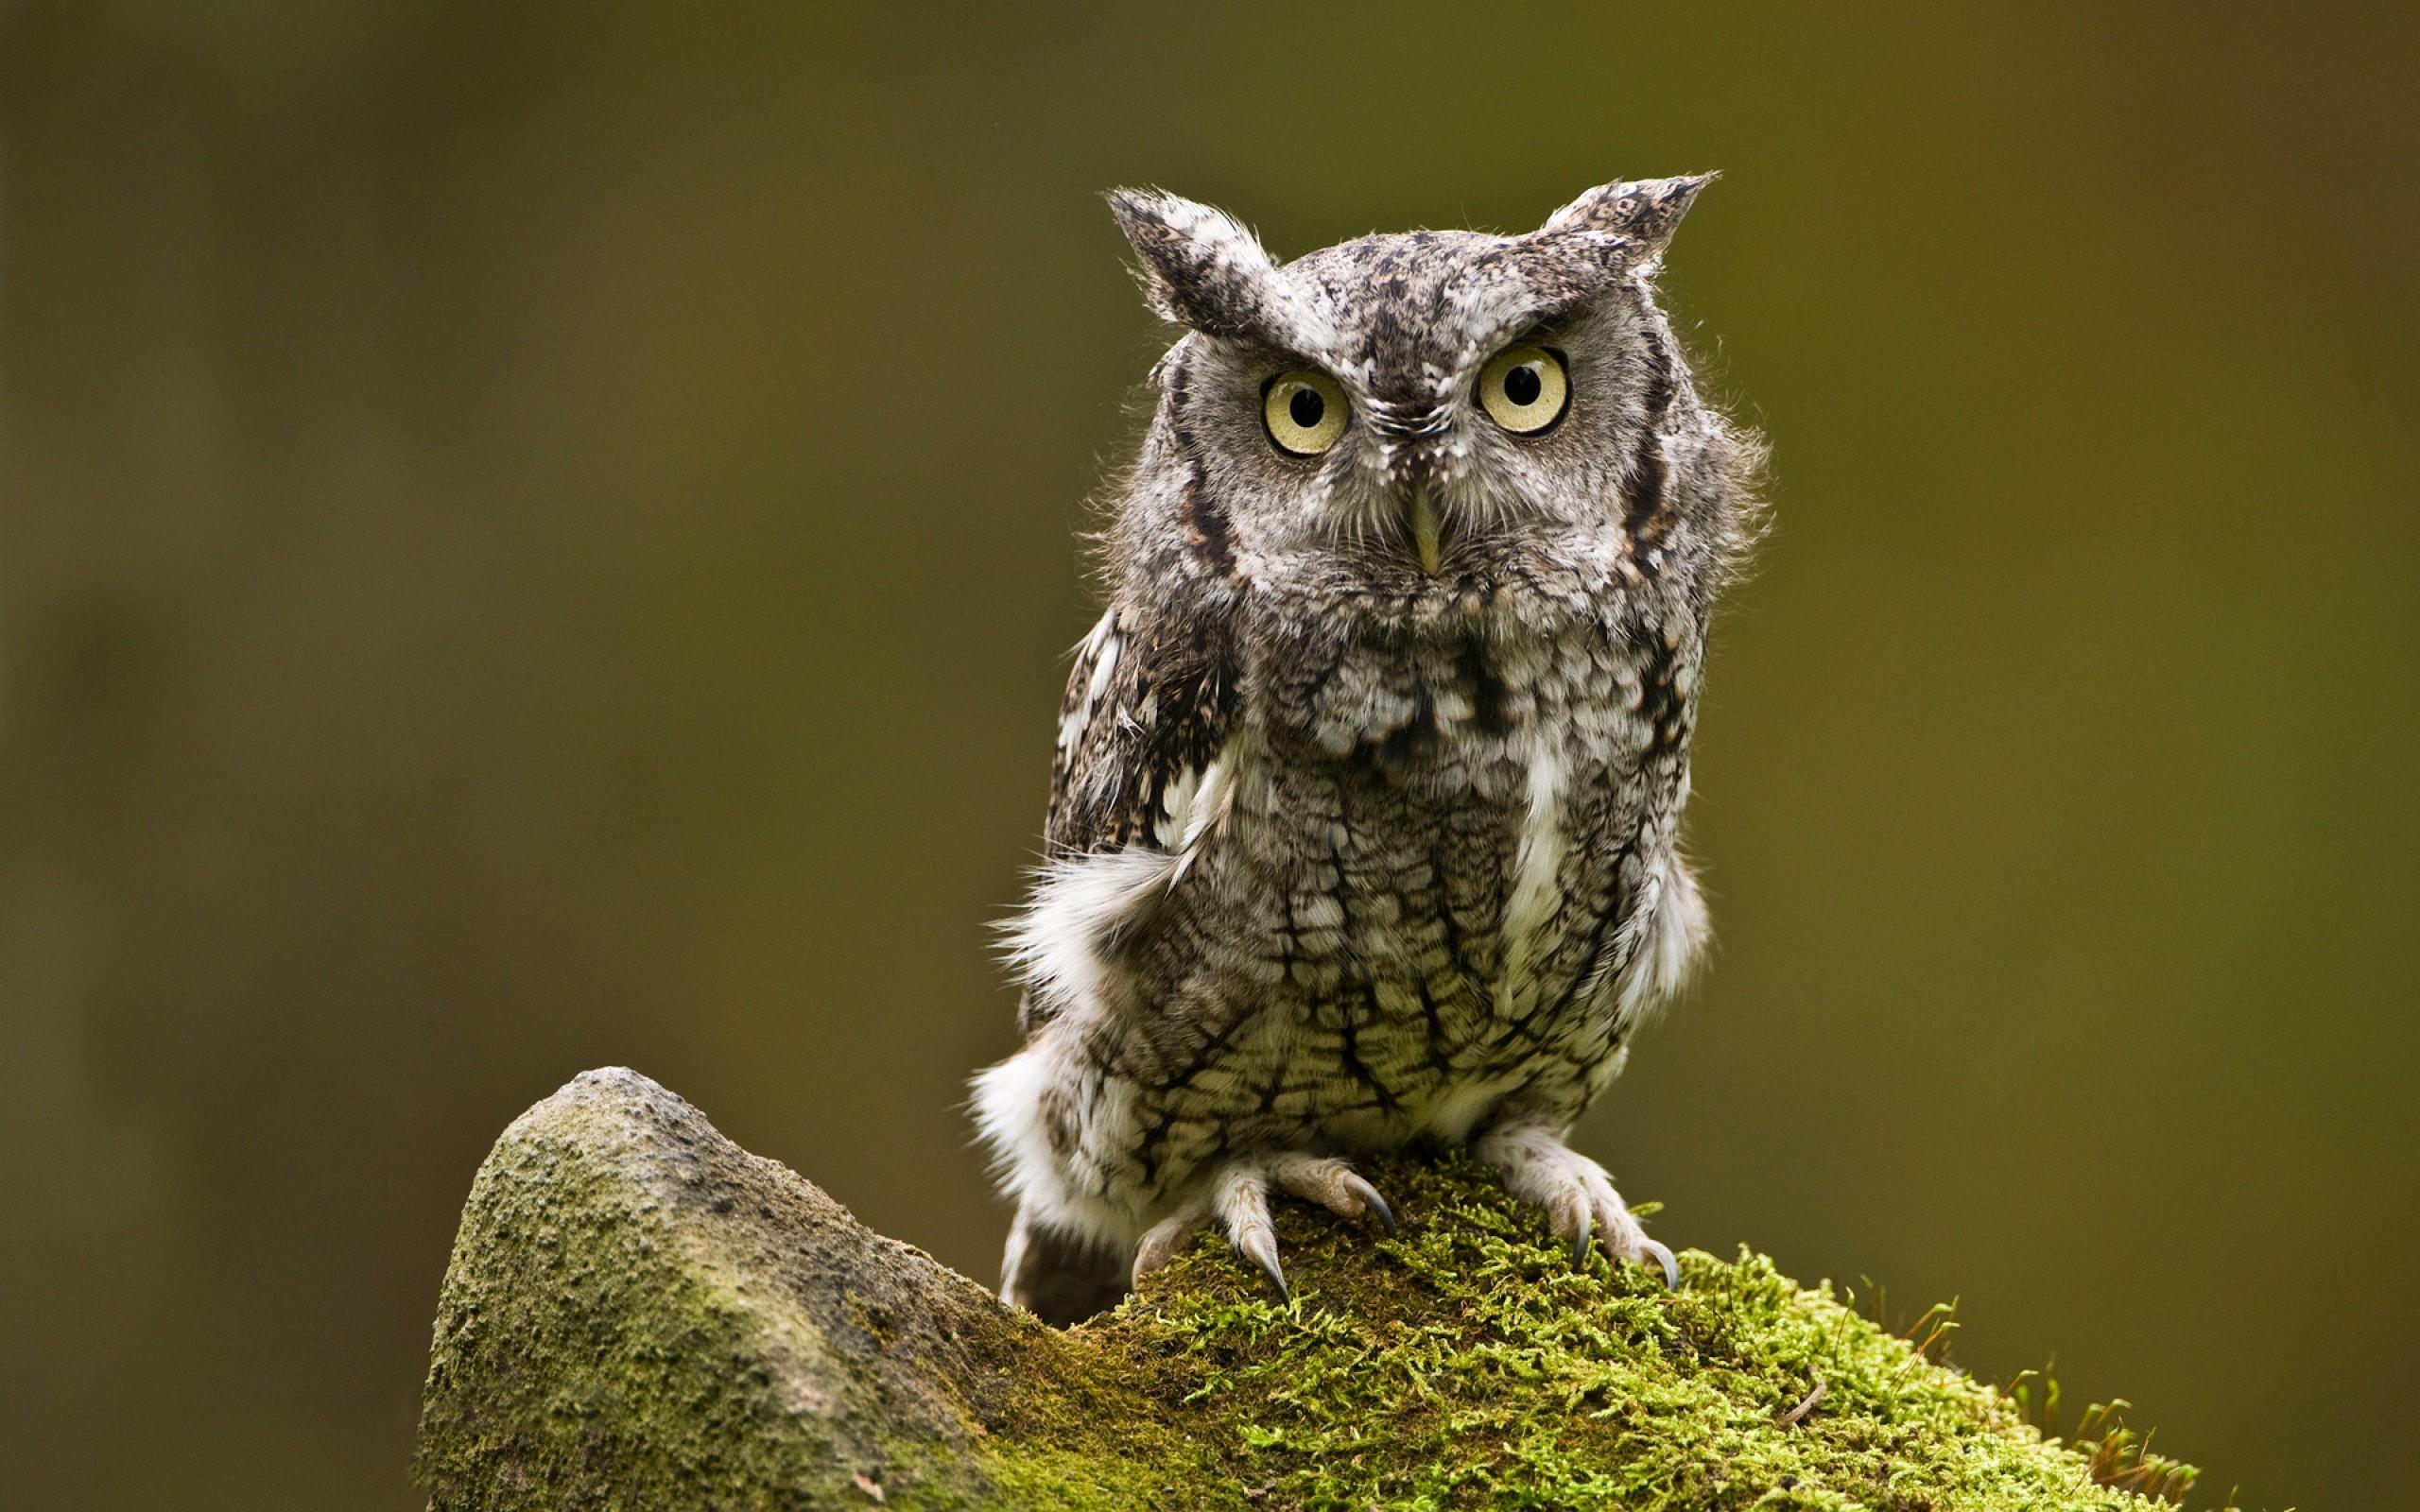 Owl High Quality Wallpaper